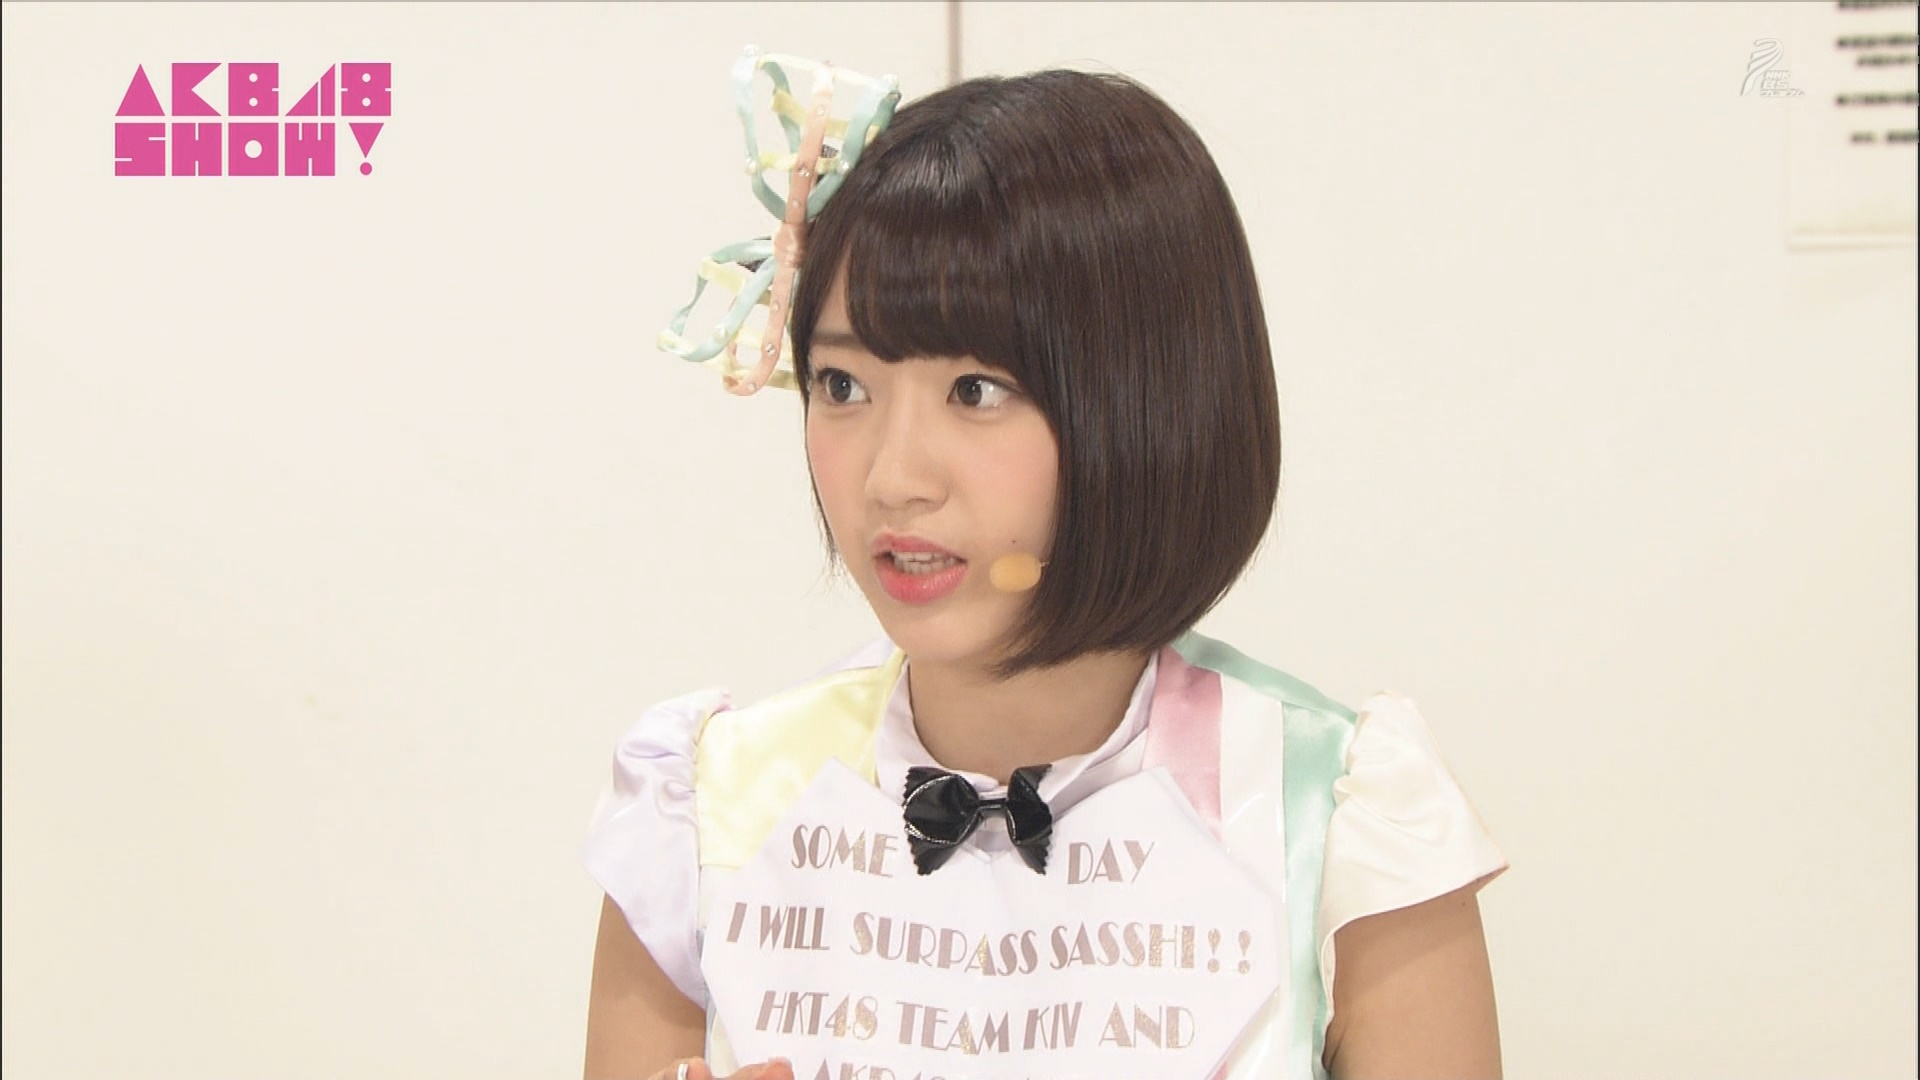 AKB48SHOW 心のプラカード 宮脇咲良 20140830 (7)